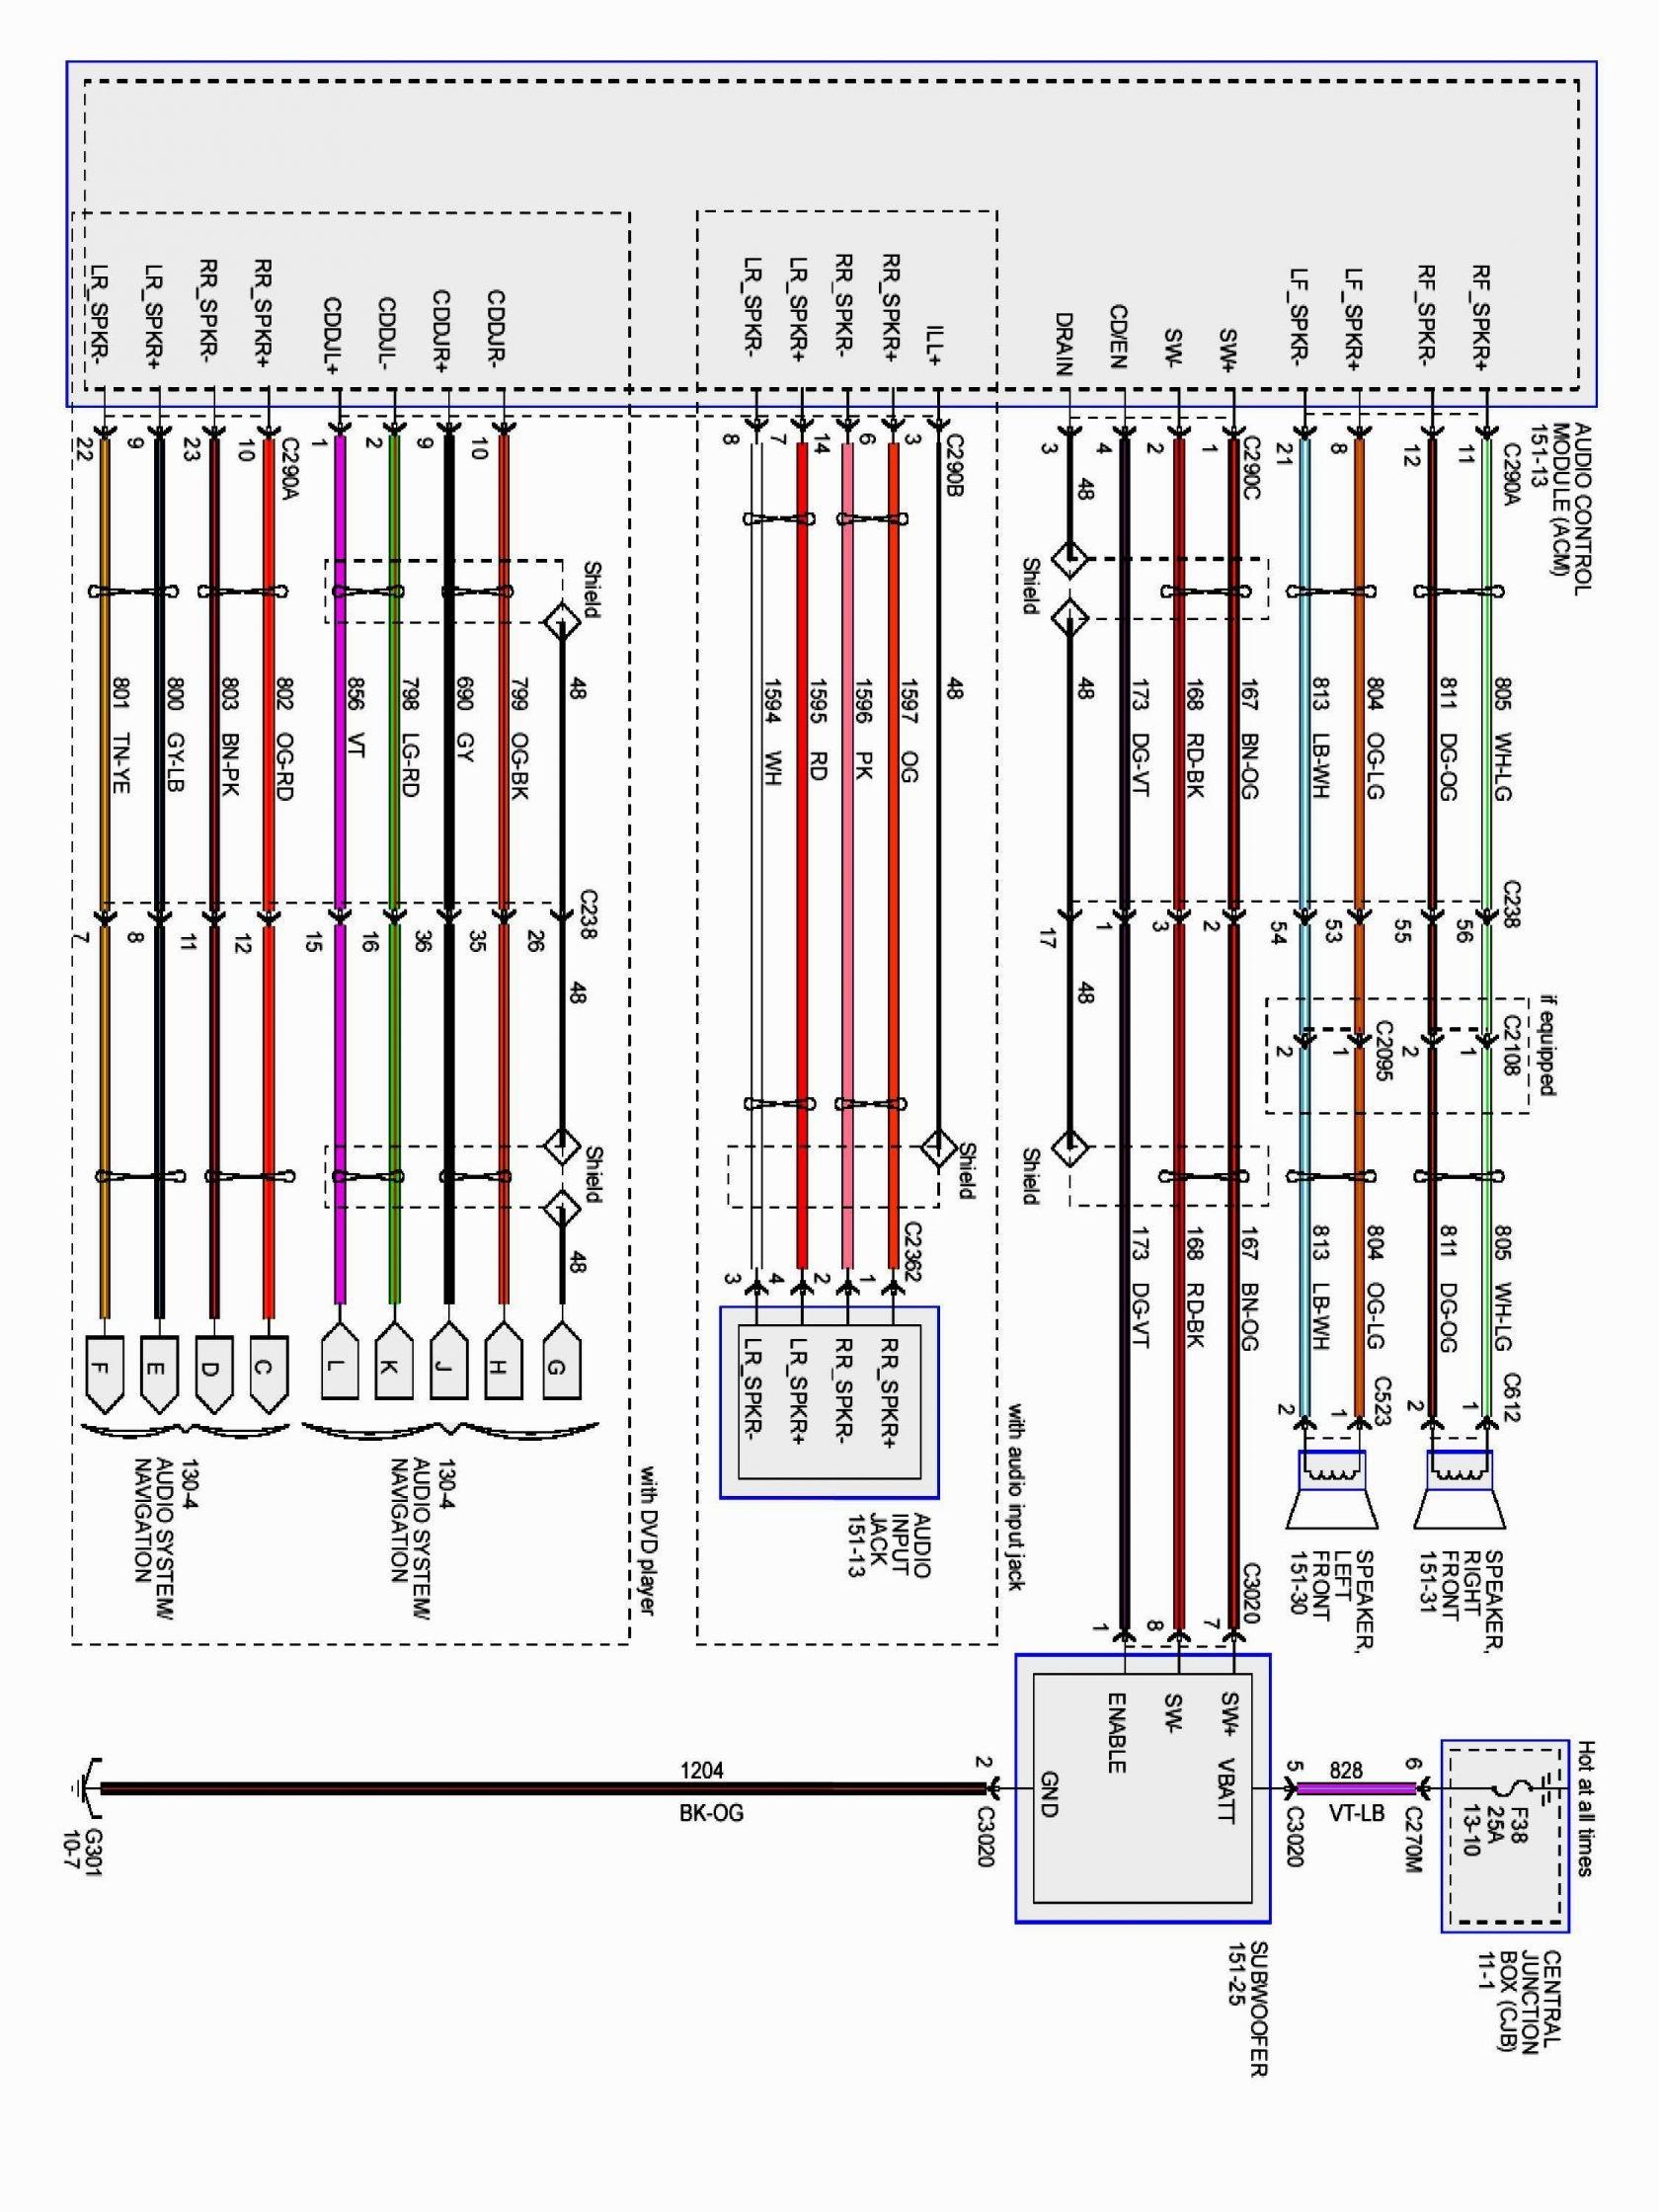 [SCHEMATICS_49CH]  DW_6105] Mustang Radio Wiring Harness | 2000 Ford Mustang Radio Wiring |  | Osuri Getap Sieg Viewor Kapemie Mohammedshrine Librar Wiring 101